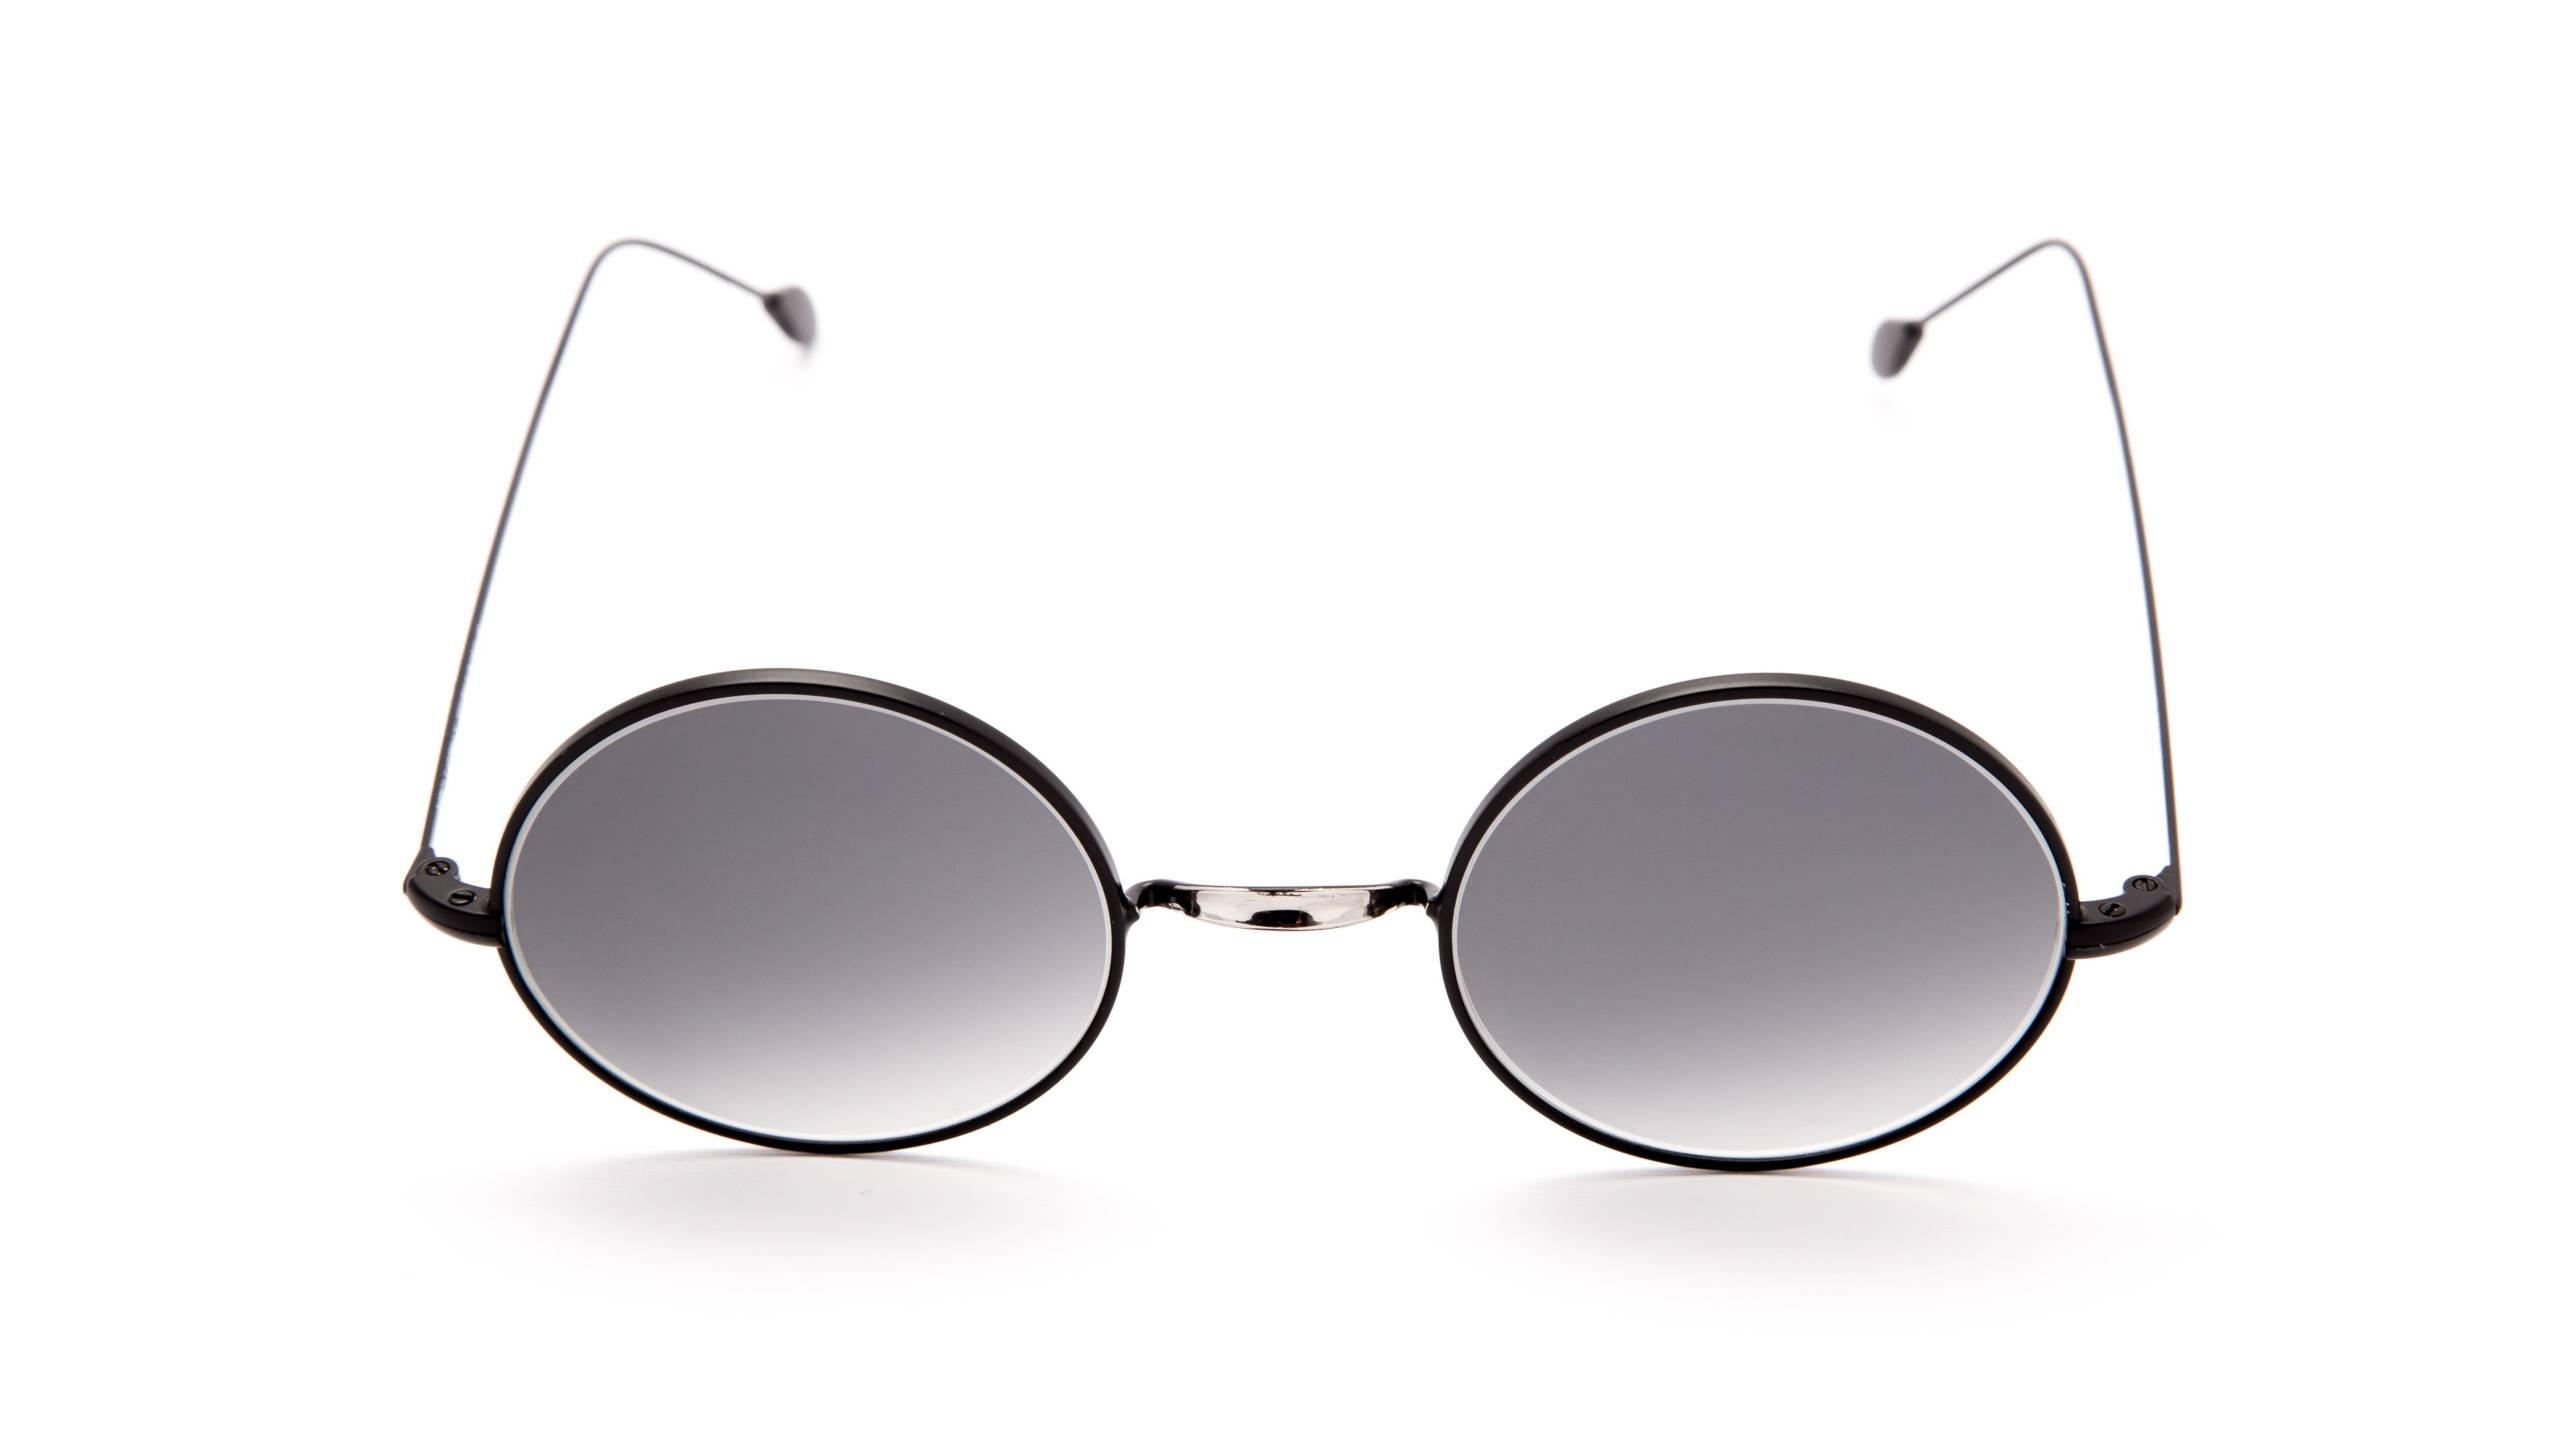 eyeglasses-Nathan-Kaltermann-made-in-Italy-ISCHIA-NERO-UNISEX-SOLE1